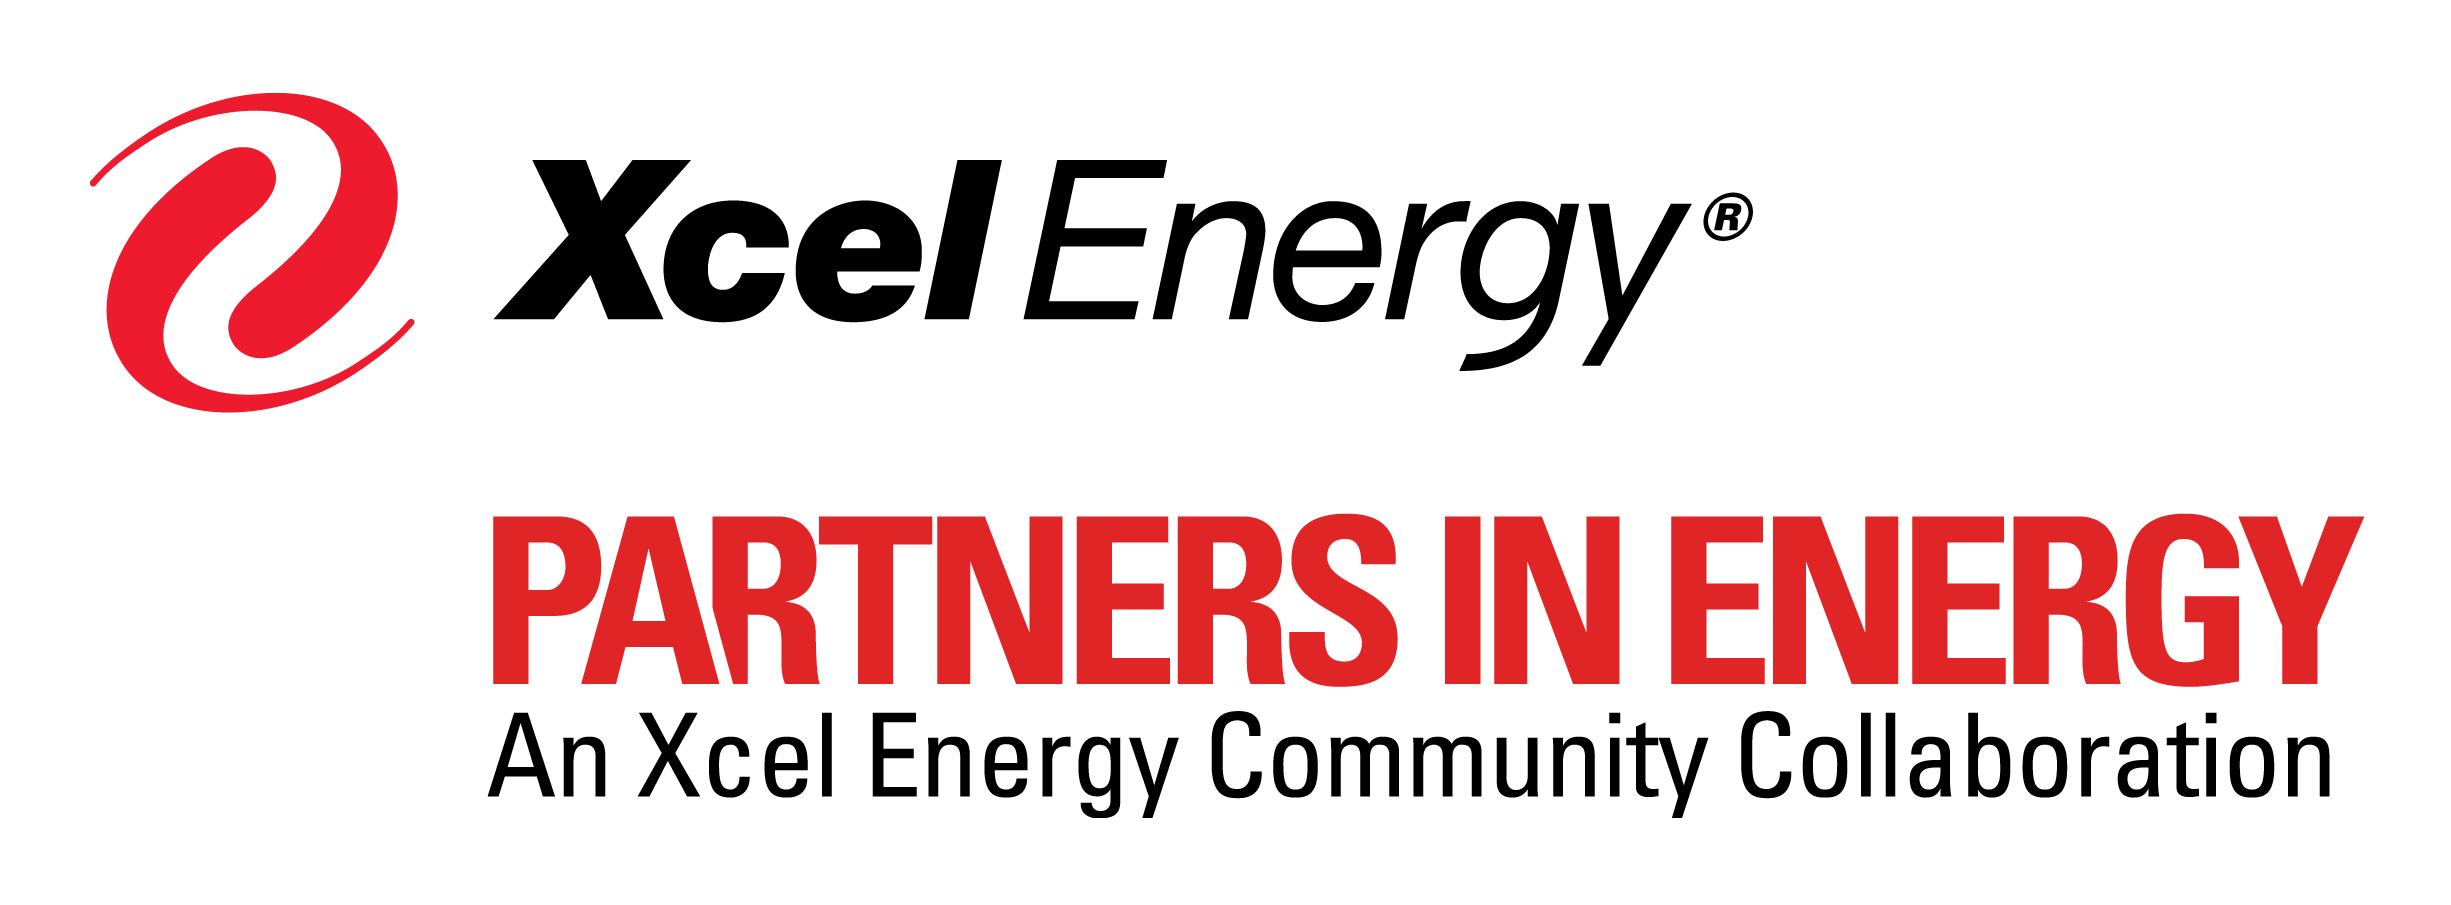 Partners in Energy logo